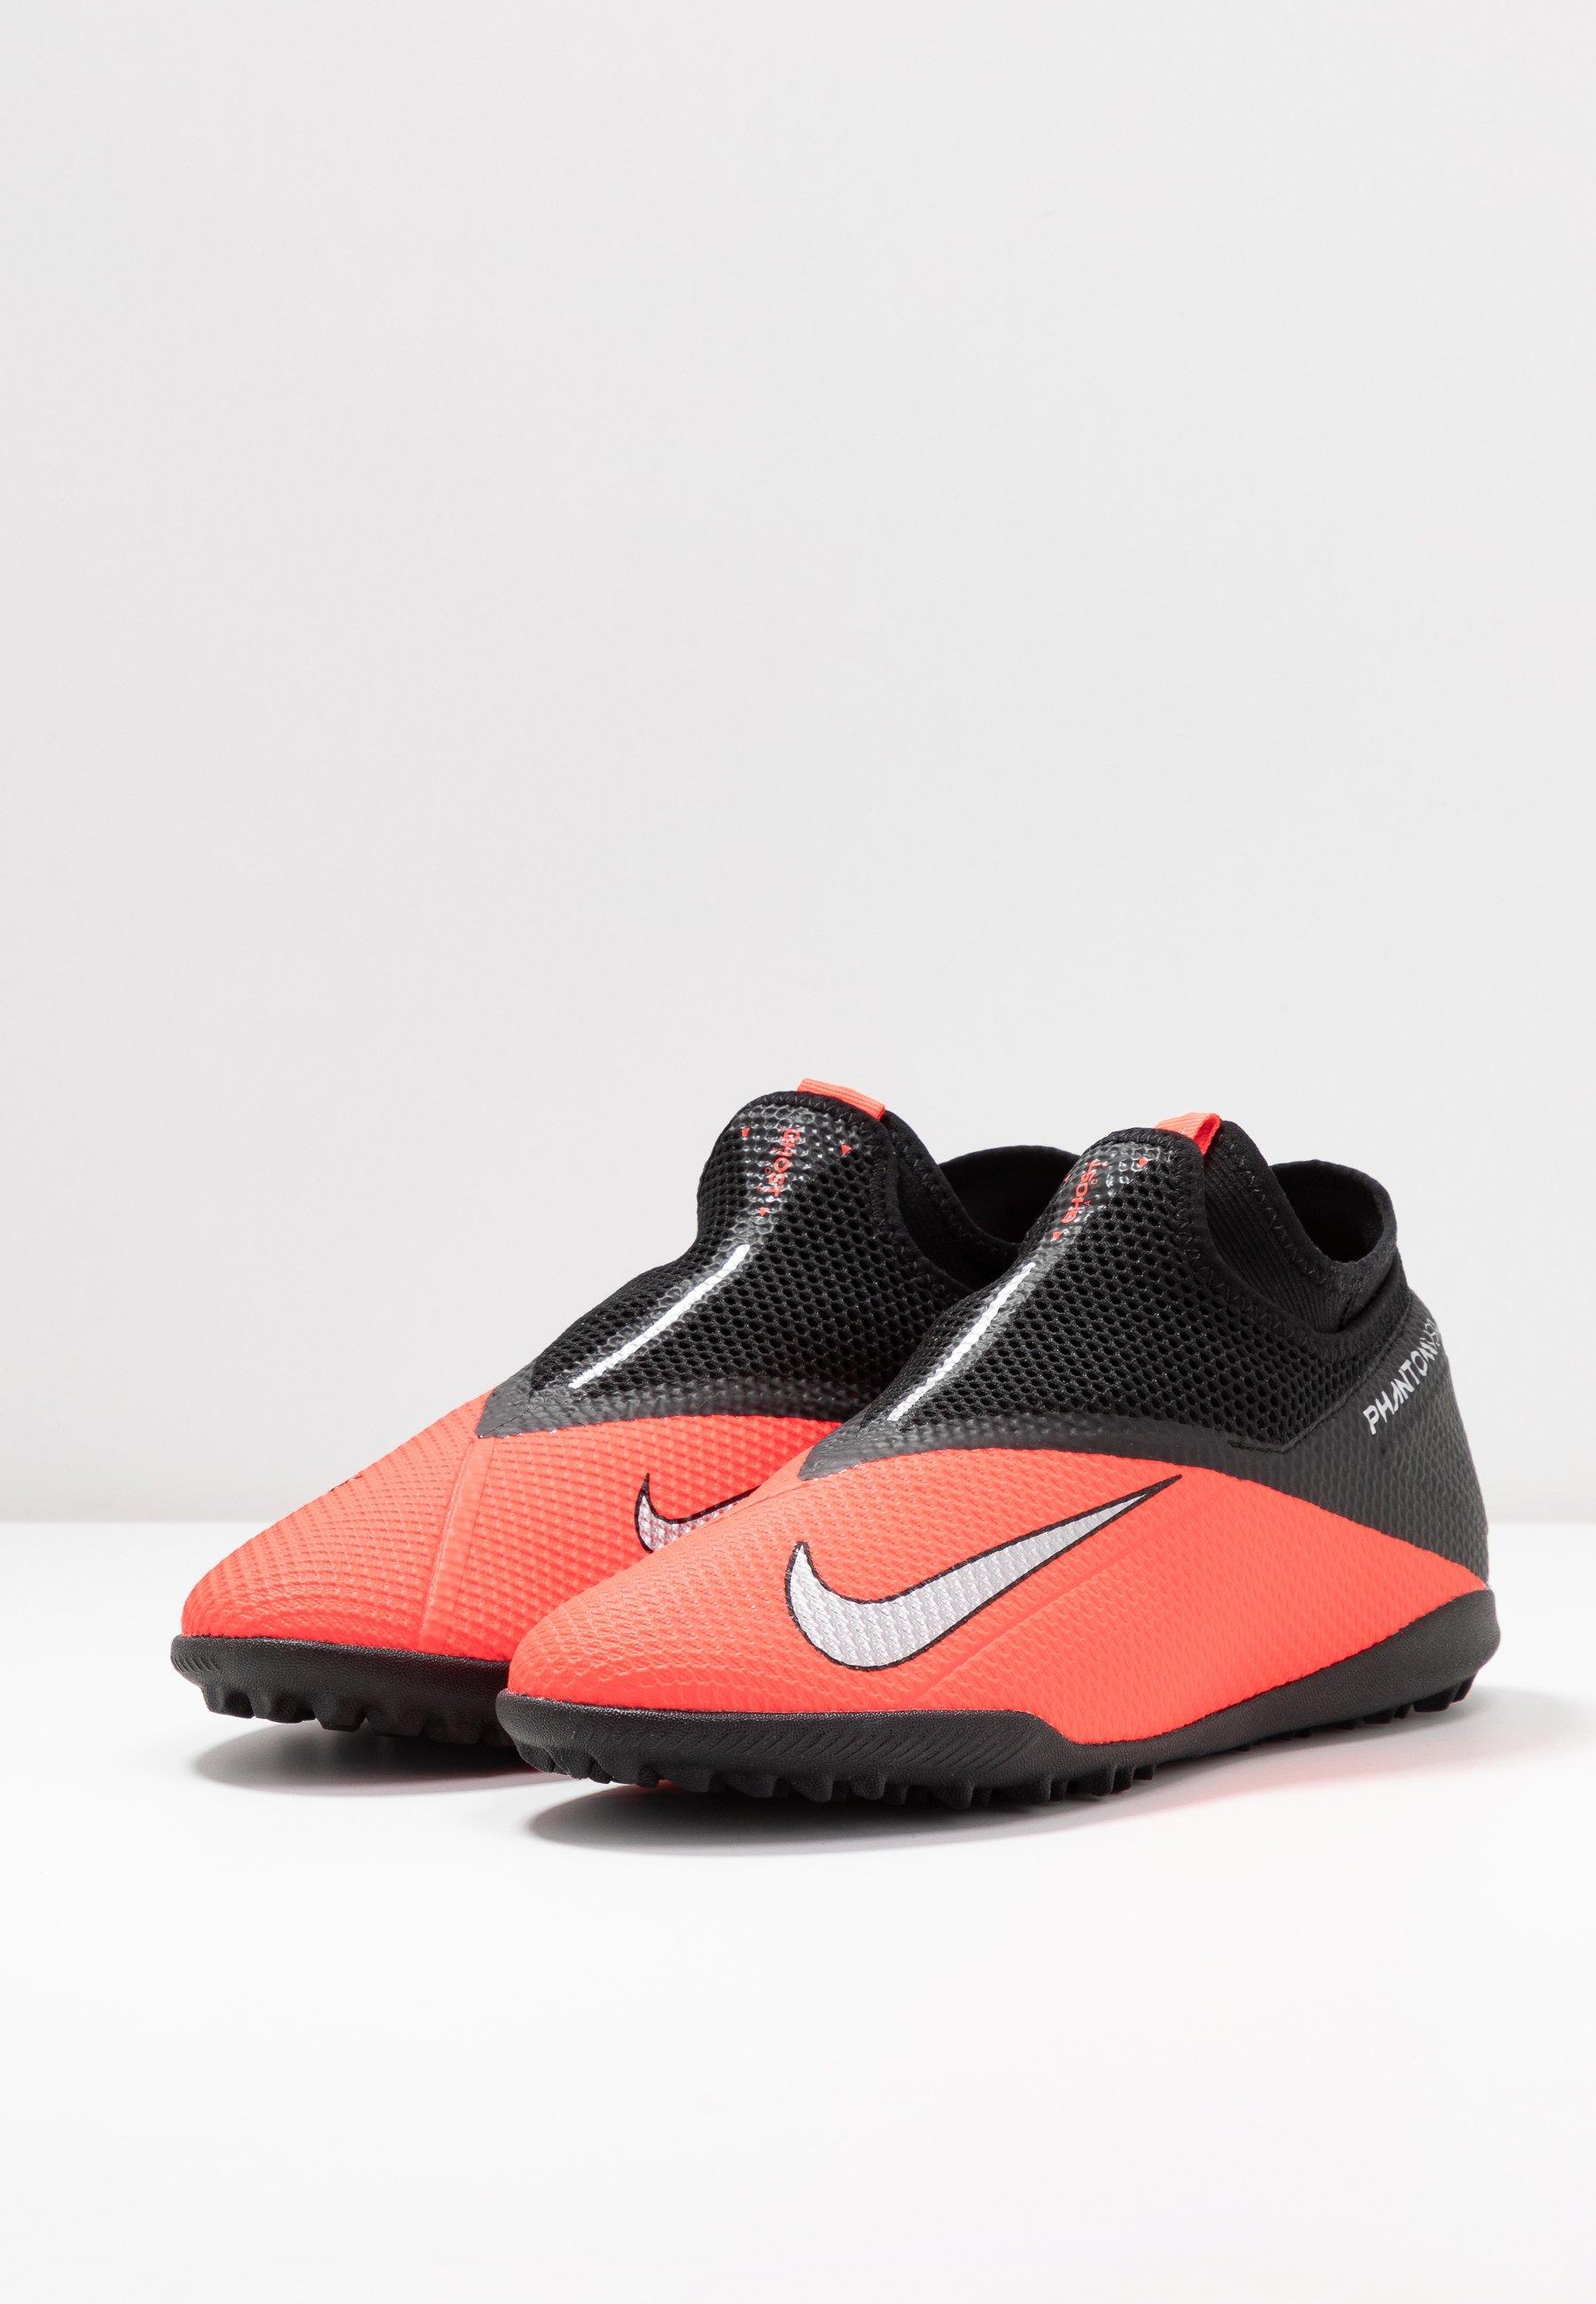 Nike Performance PHANTOM VISION 2 ACADEMY DF TF - Fußballschuh Multinocken - laser crimson/metallic silver/black/rot - Herrenschuhe 0VHCa